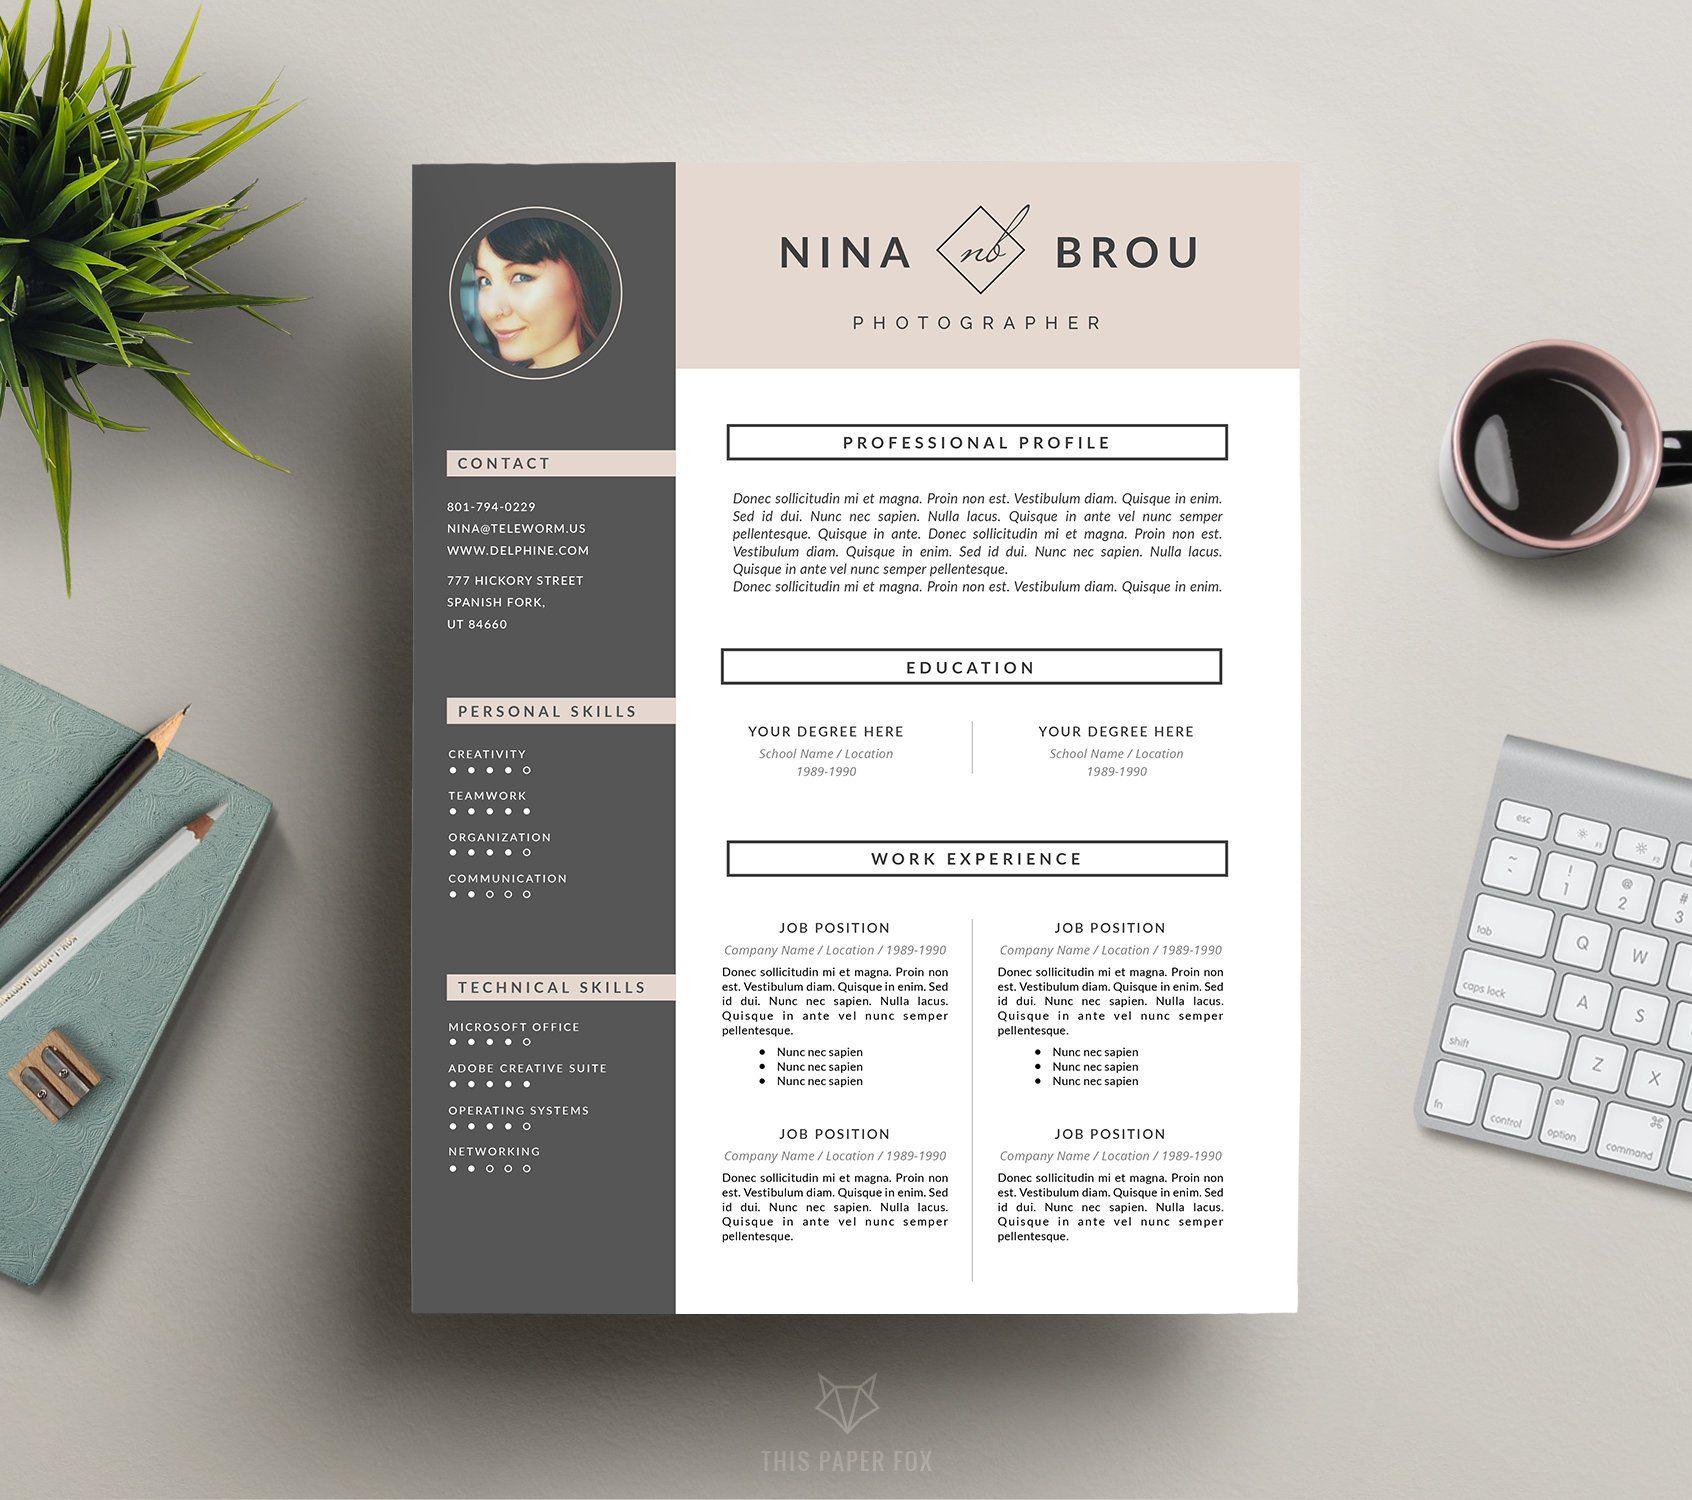 Feminine Resume Design Cv Resume Design Creative Resume Templates Feminine Resume